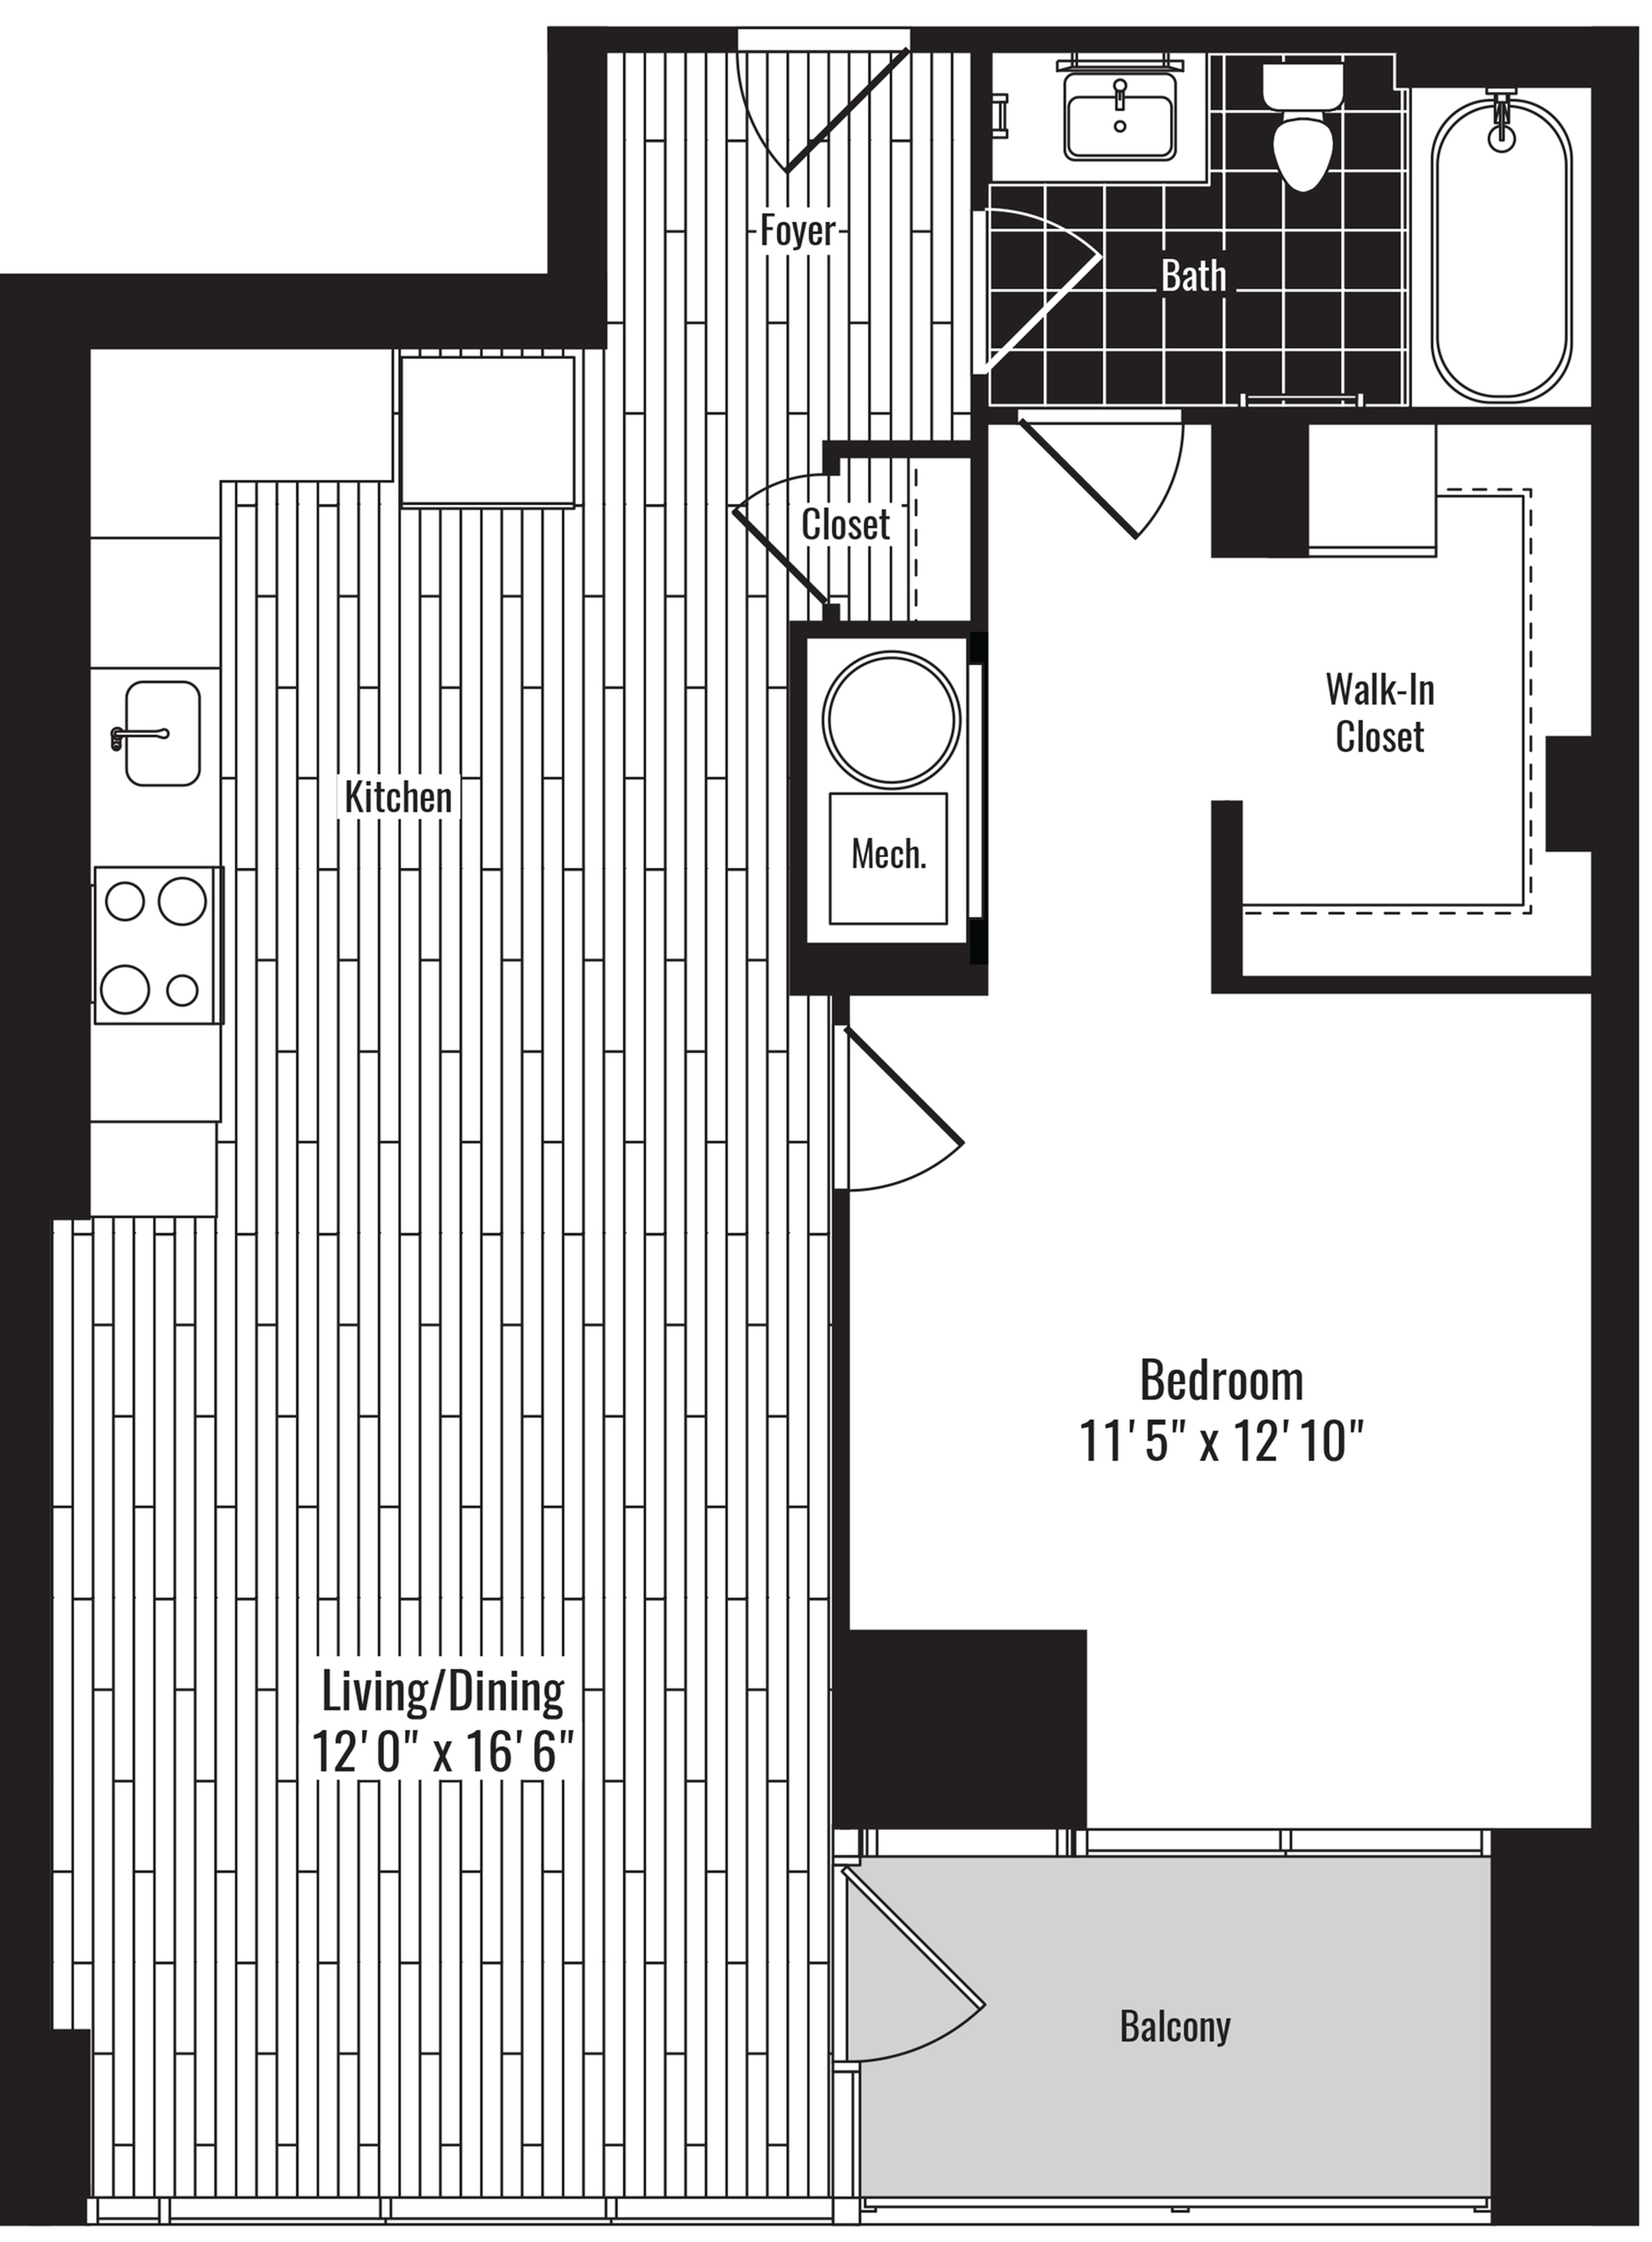 740 square foot one bedroom one bath apartment floorplan image